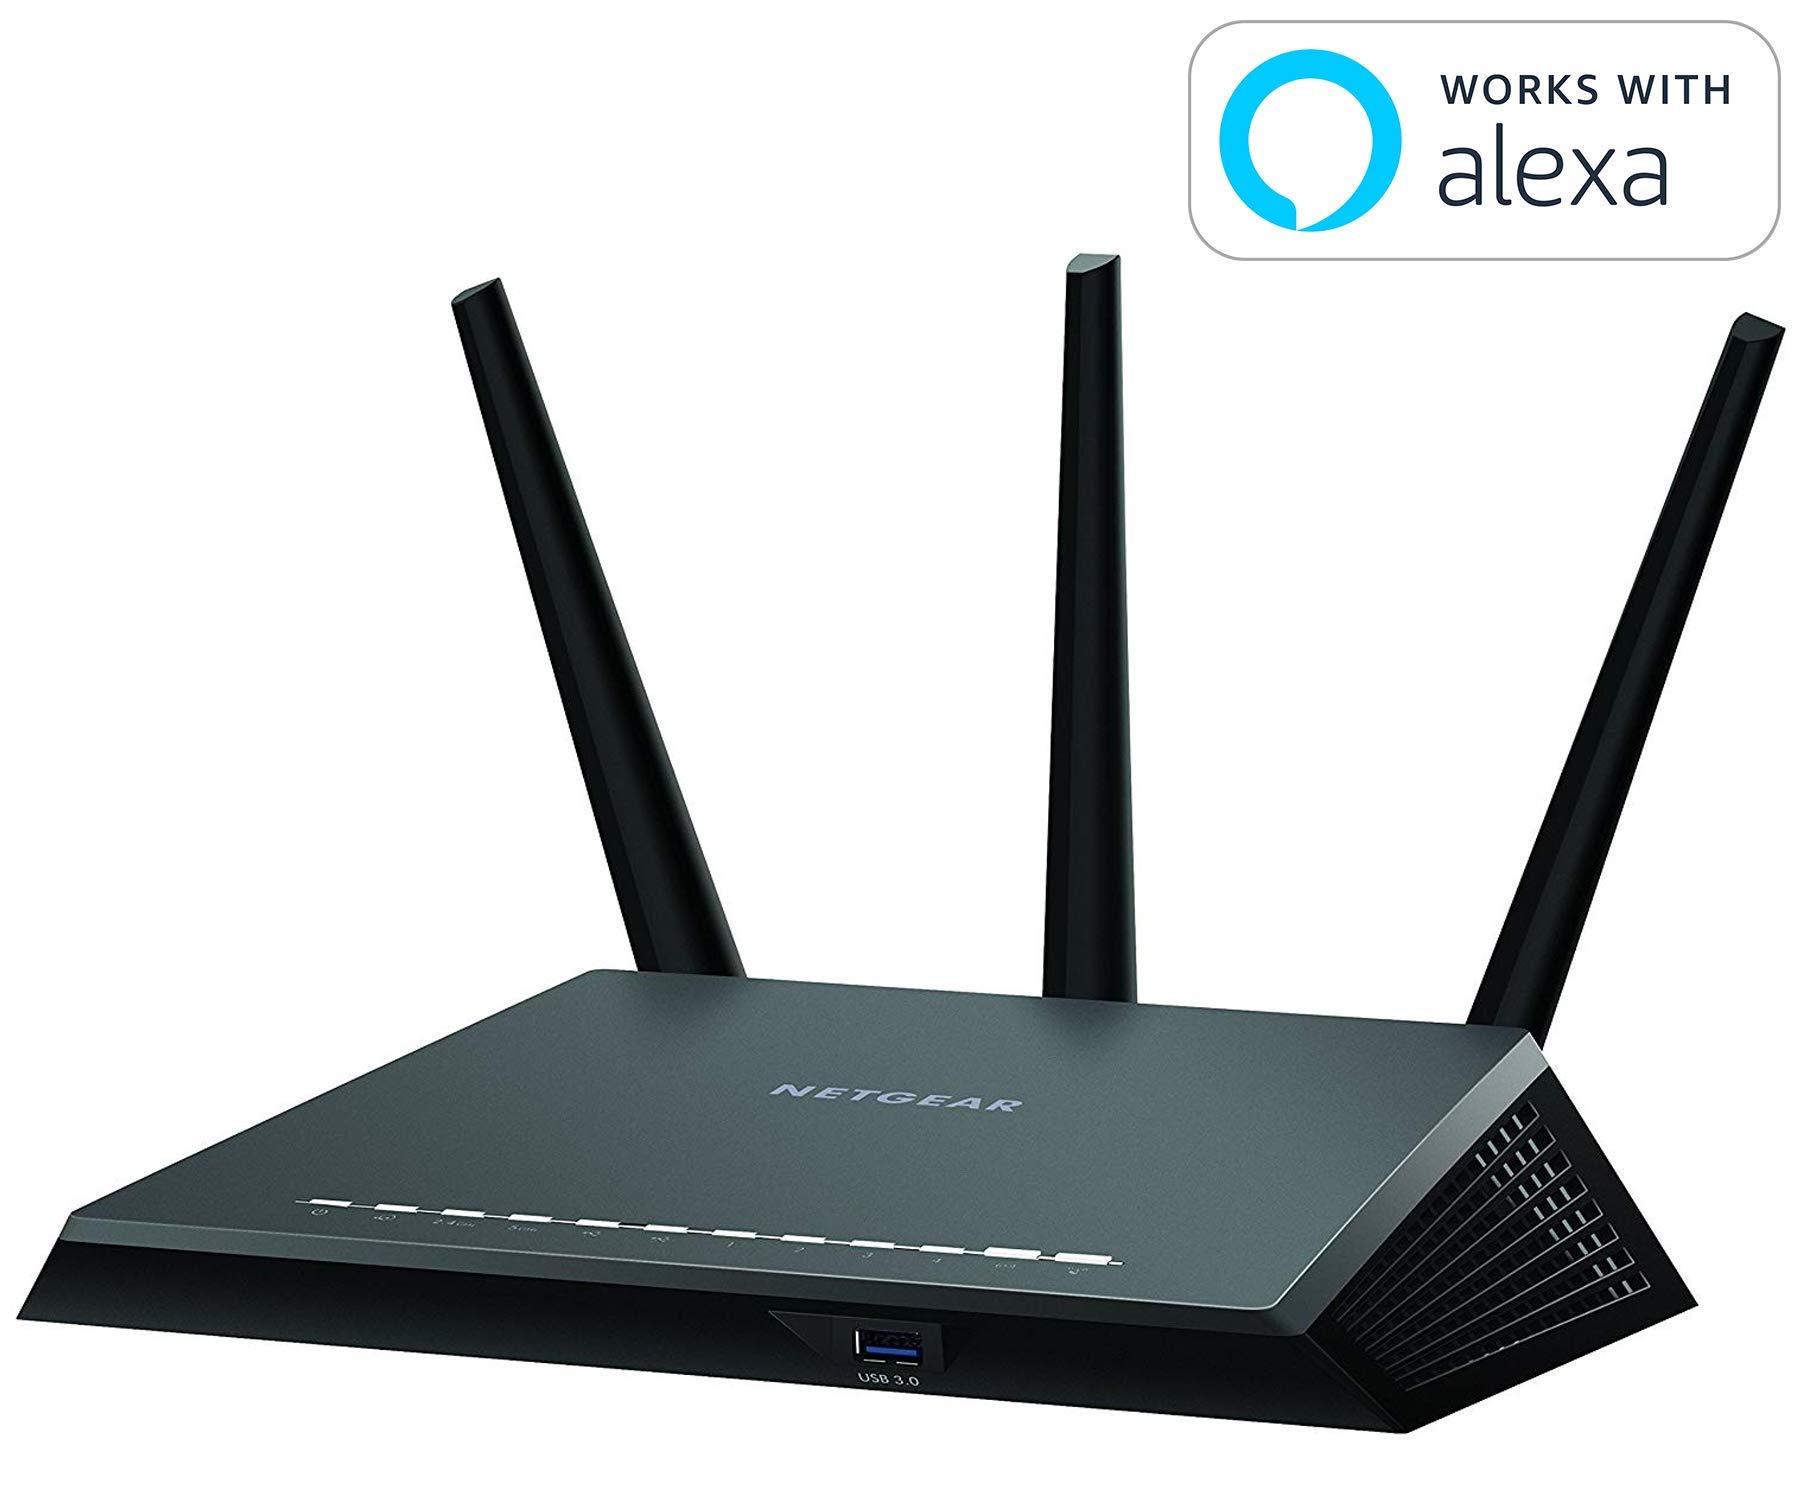 Netgear (R7000P-100NAS) Nighthawk AC2300 Dual Band Smart WiFi Router, Gigabit Ethernet, MU-MIMO, Compatible with Amazon Echo/Alexa and Circle Smart Parental Controls (Renewed) by NETGEAR